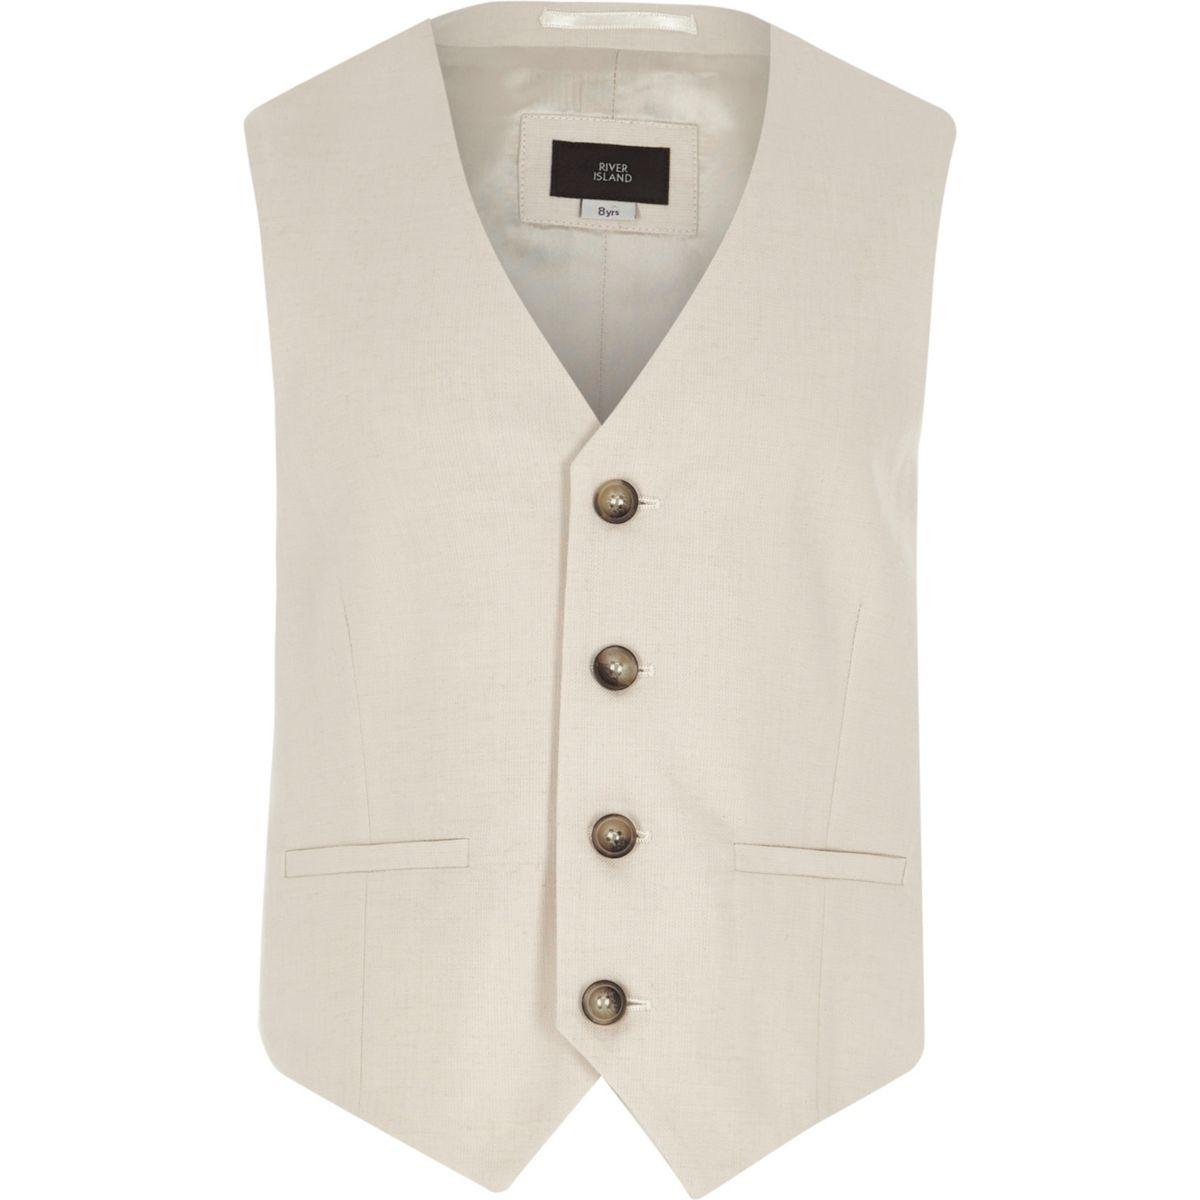 Boys cream suit waistcoat with linen